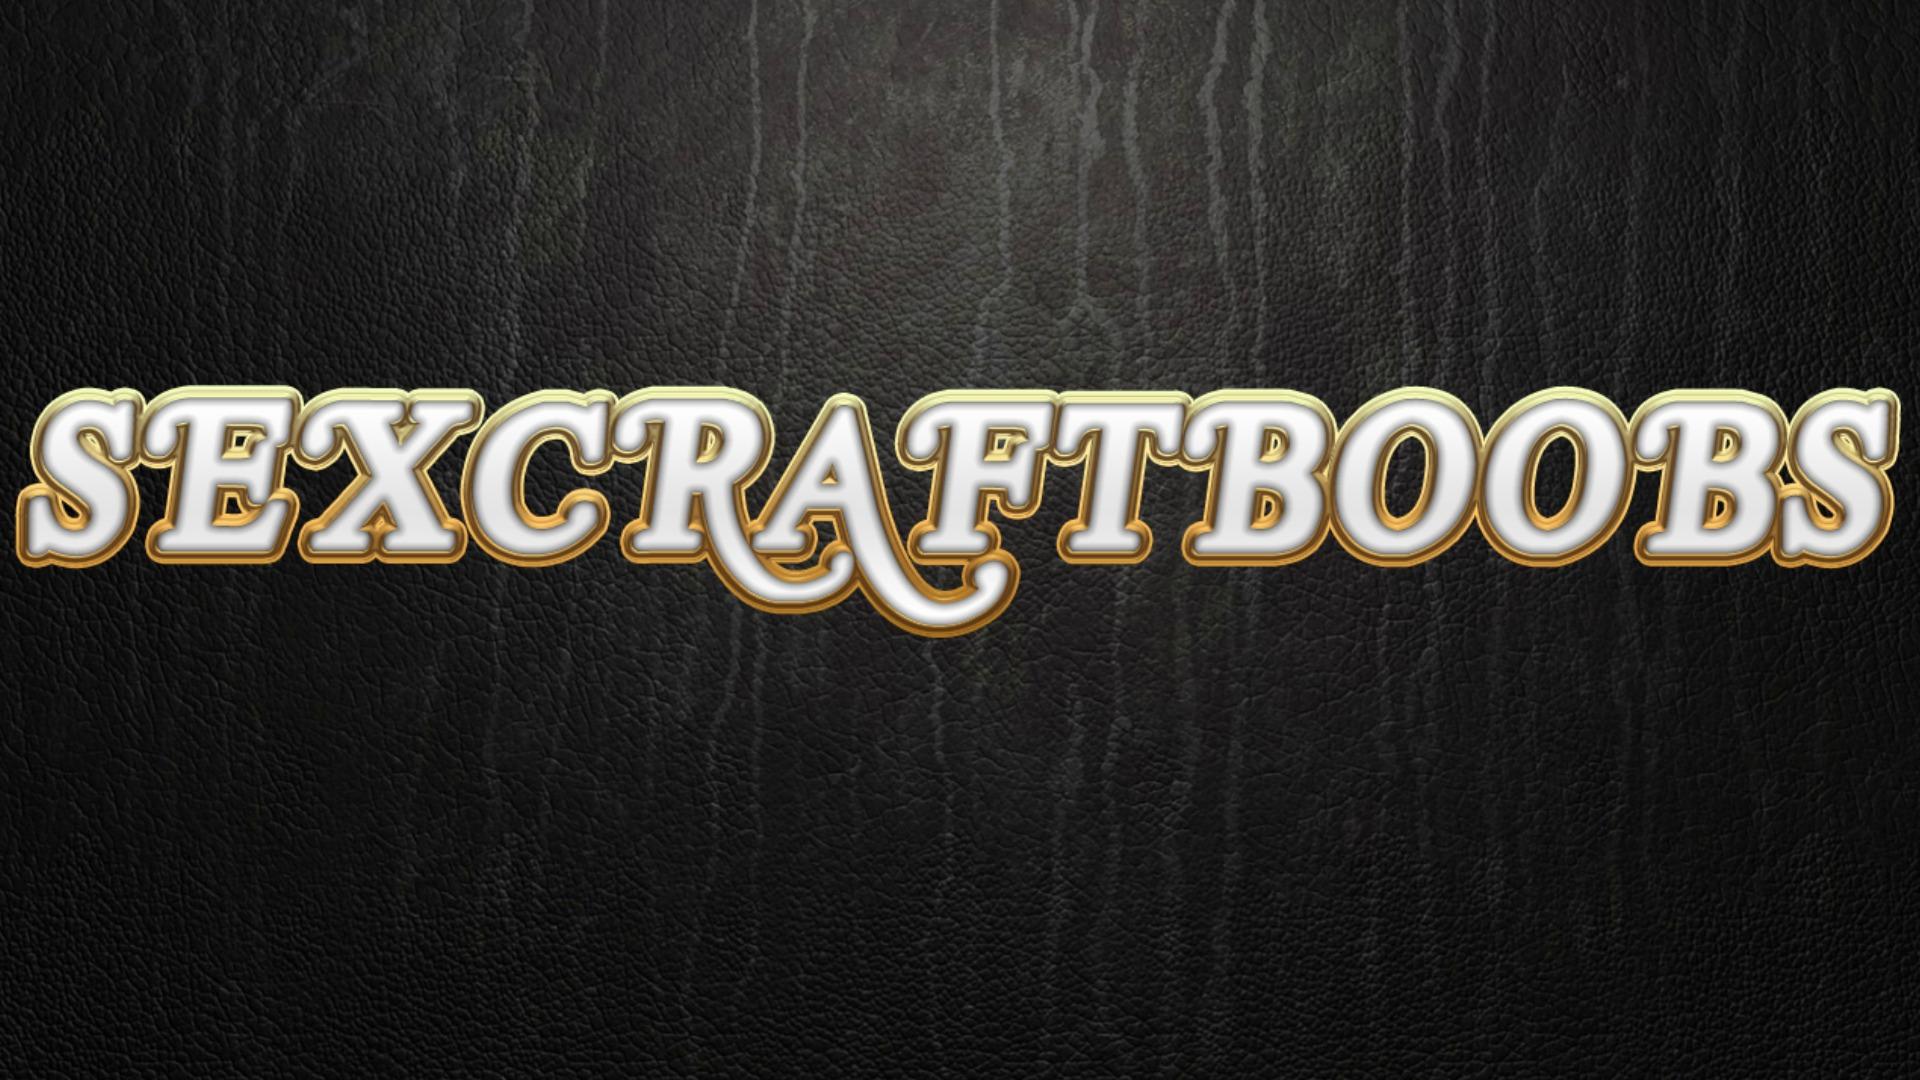 Sexcraftboob-Studio